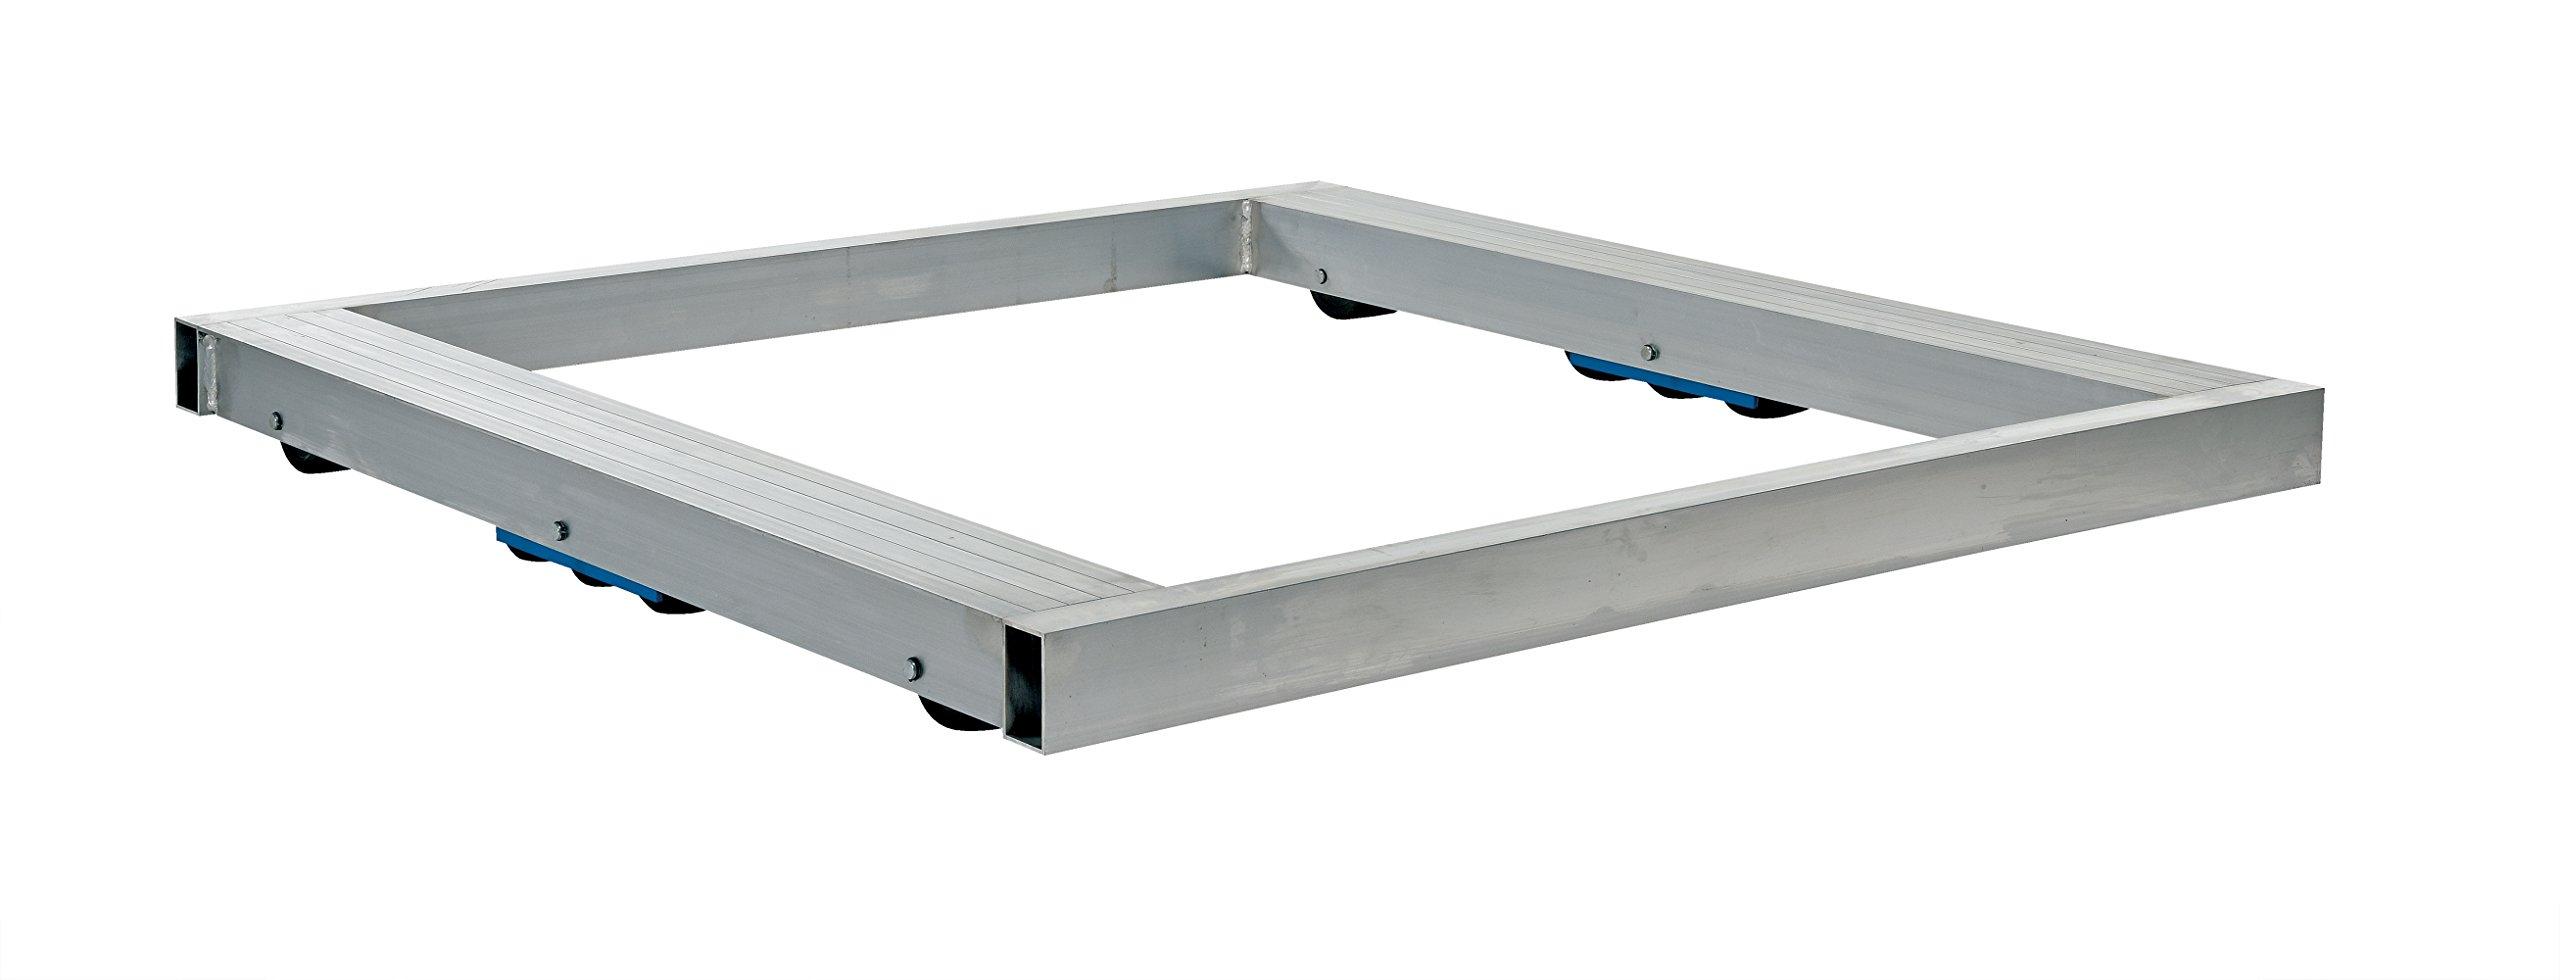 Vestil DOL-4242-10T Pallet Dolly, Tilting, Aluminum, 8,000 lb. Capacity, 4-1/8 x 42 x 42